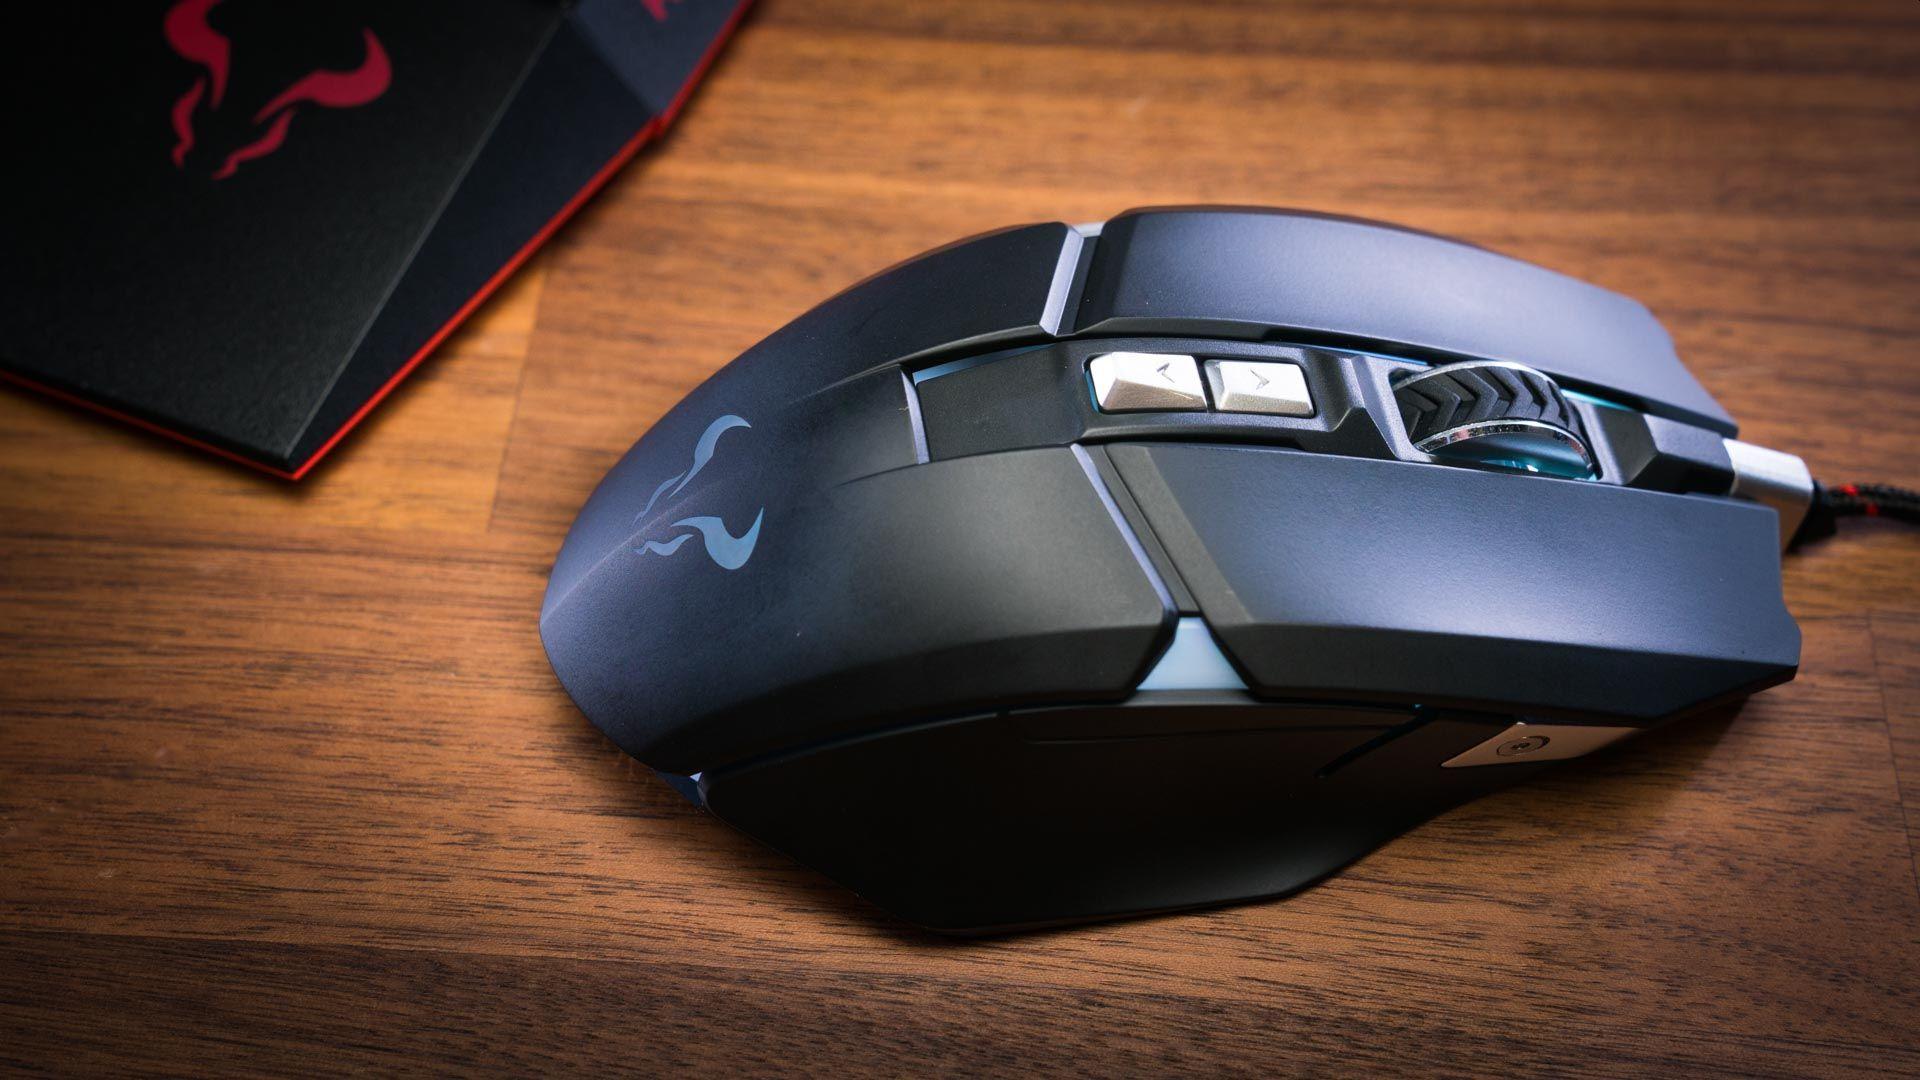 Riotoro Aurox Black Prism Mouse 10000 DPI optical sensor